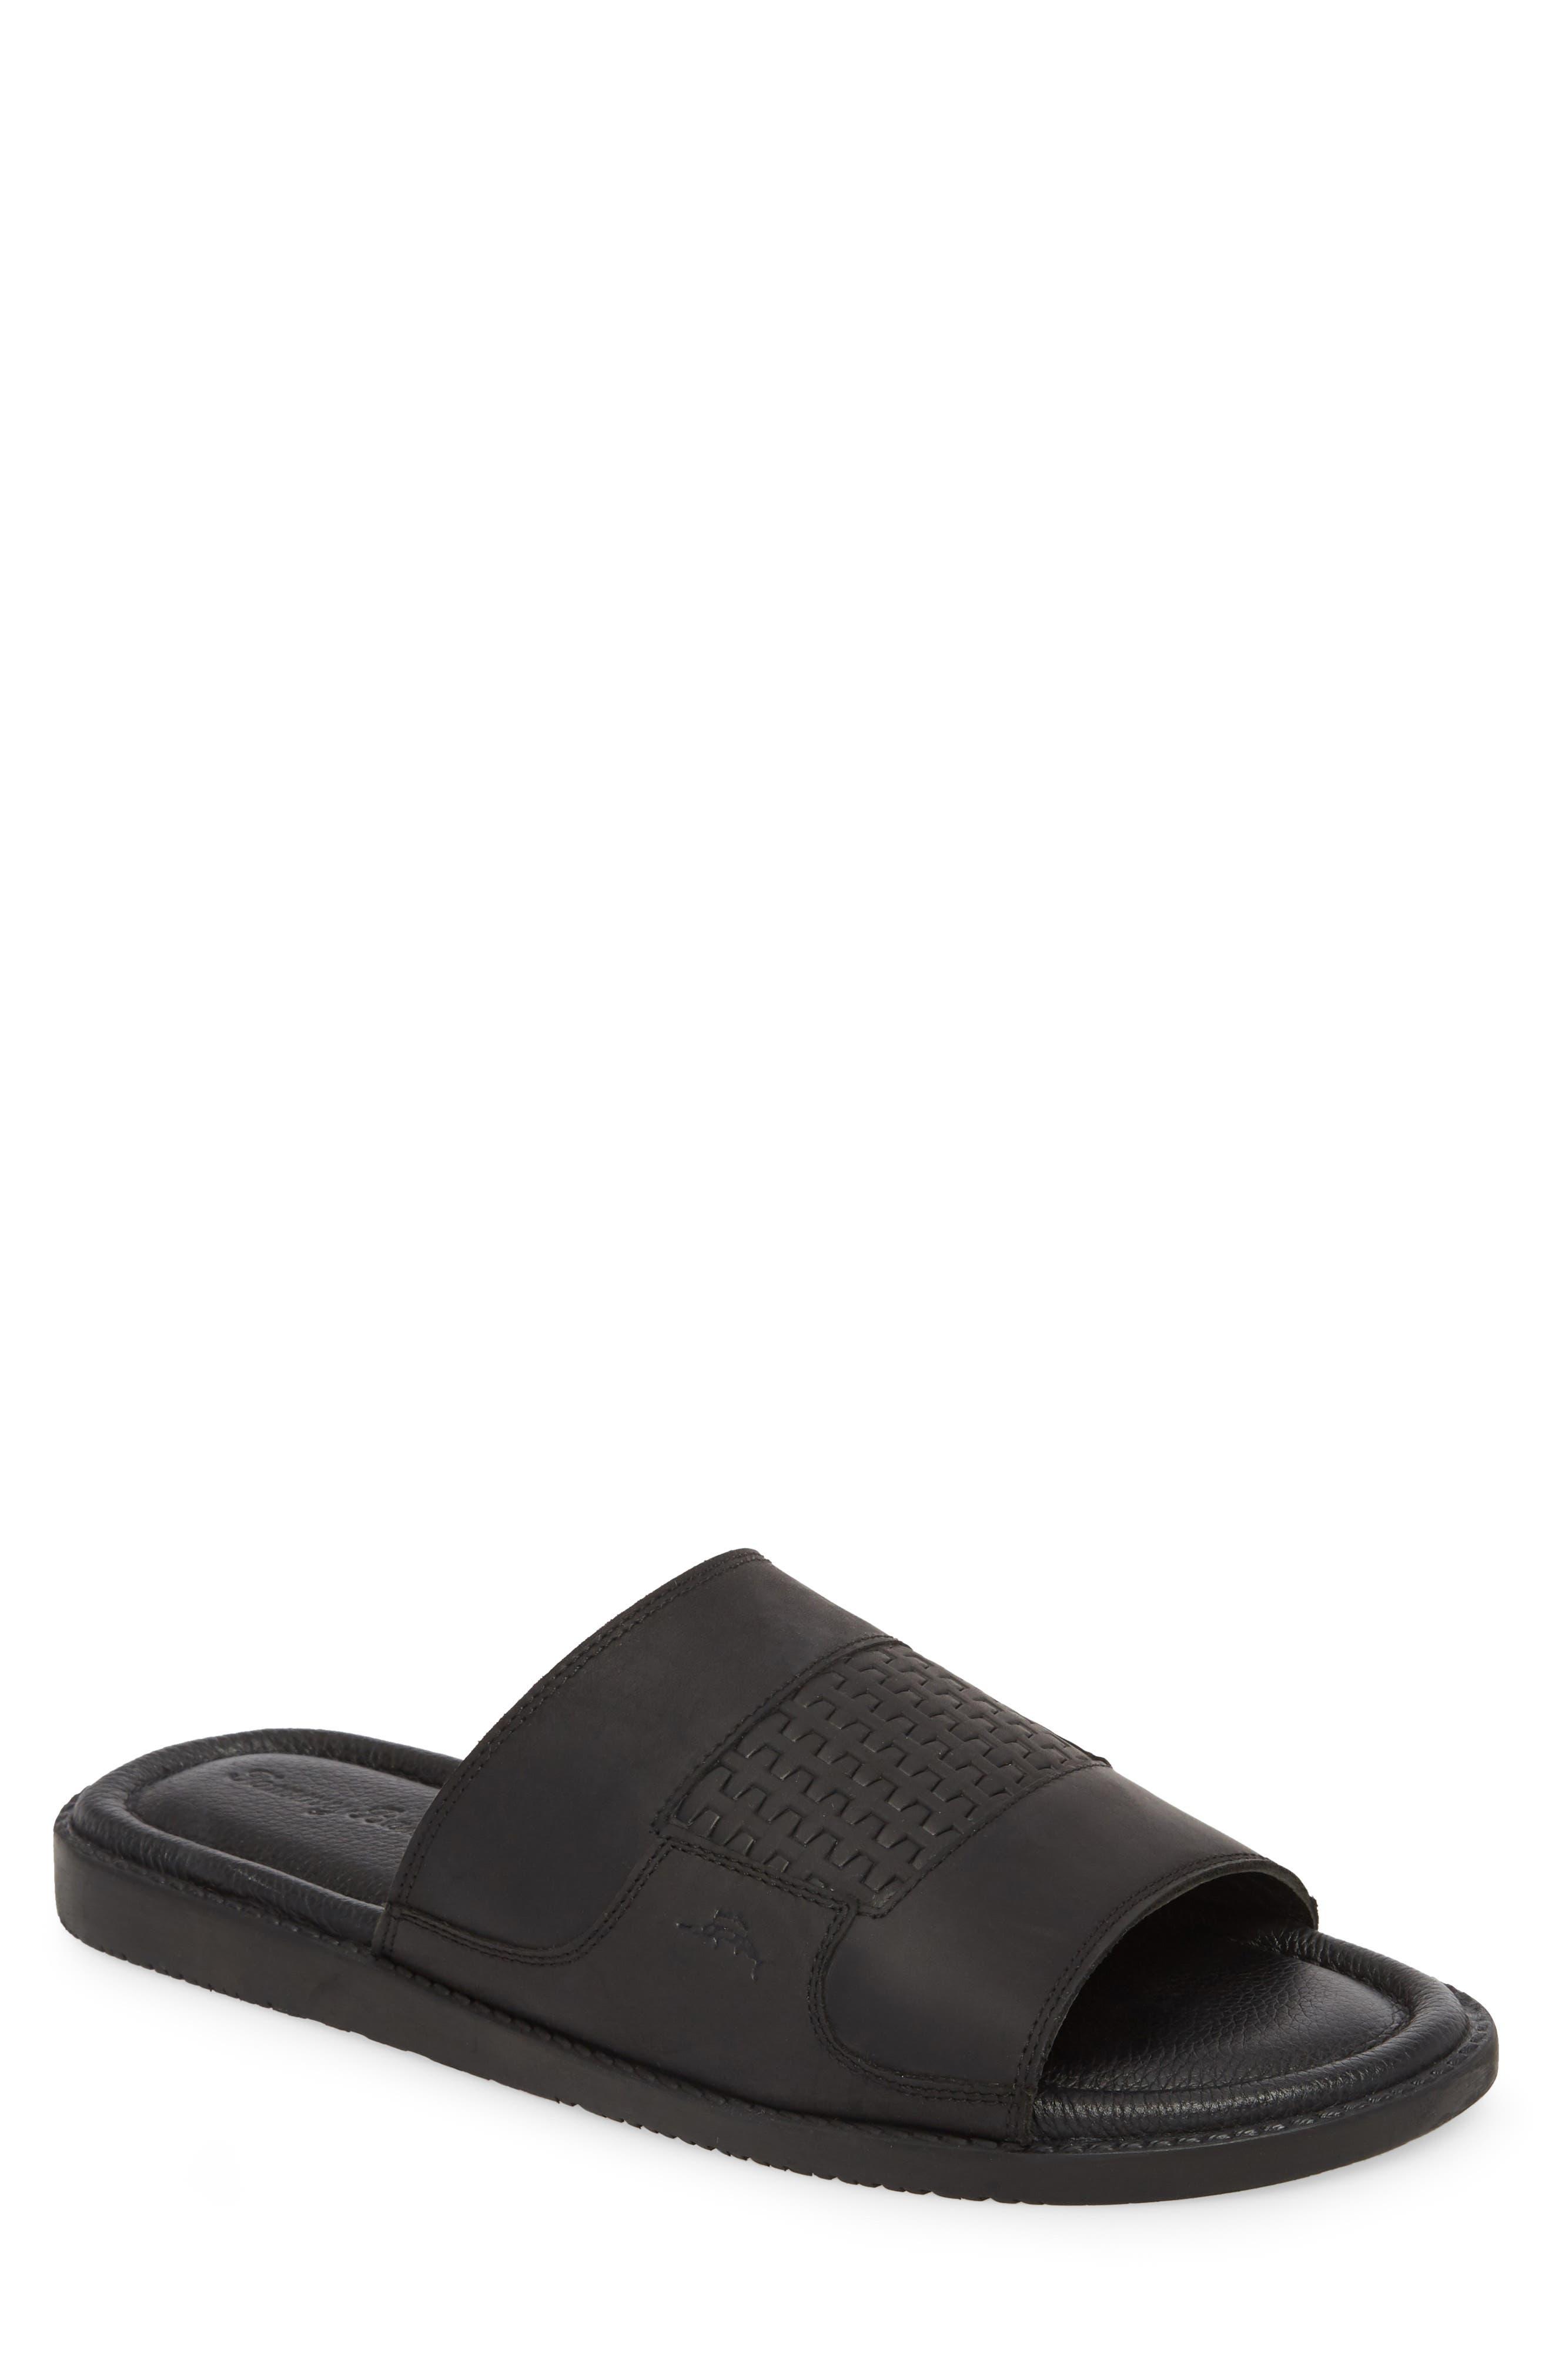 Gennadi Palms Slide Sandal,                             Main thumbnail 1, color,                             BLACK LEATHER